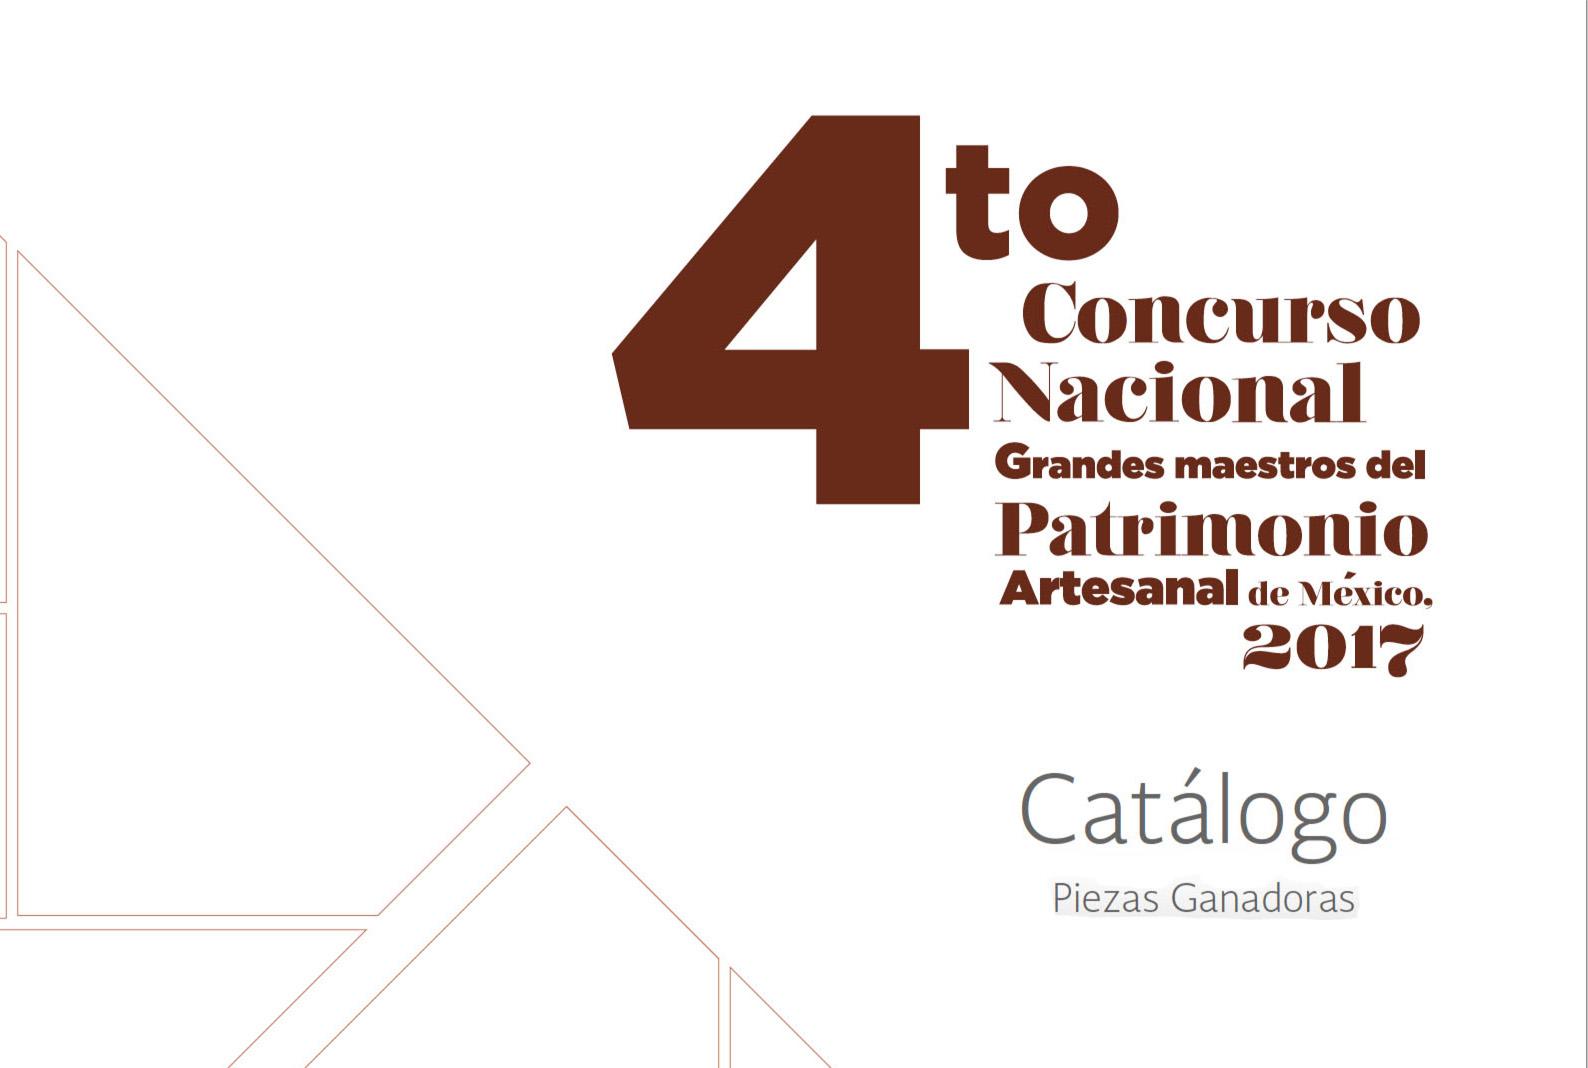 Catálogo 4to Concurso Nacional Grandes Maestros del Patrimonio Artesanal de México 2017